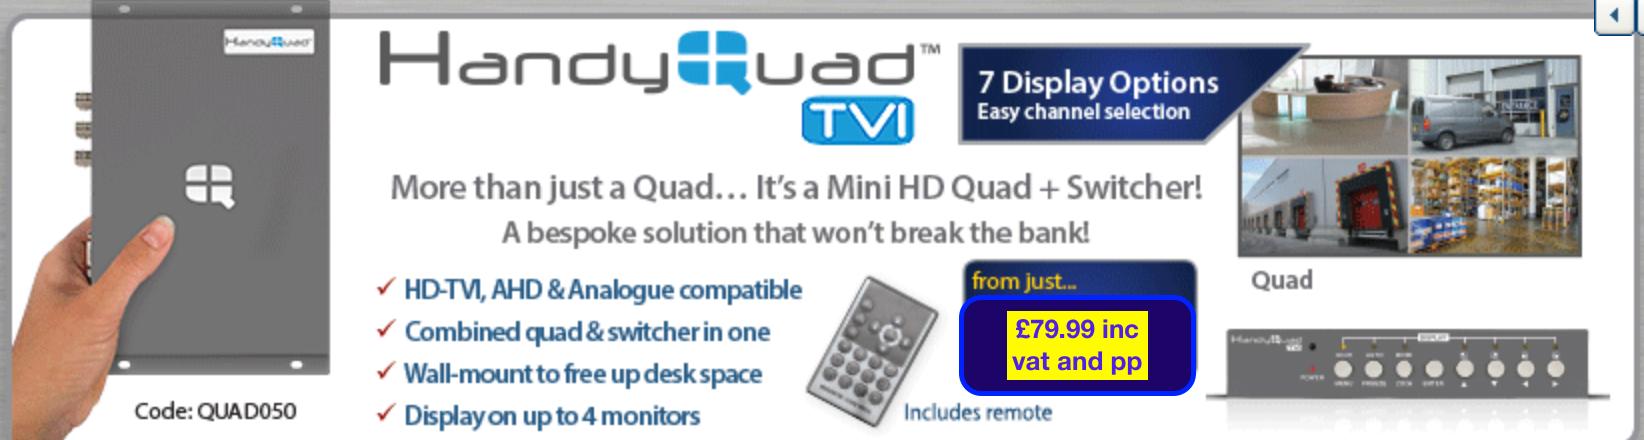 handy quad HDTI to analogue styluscom video intercom